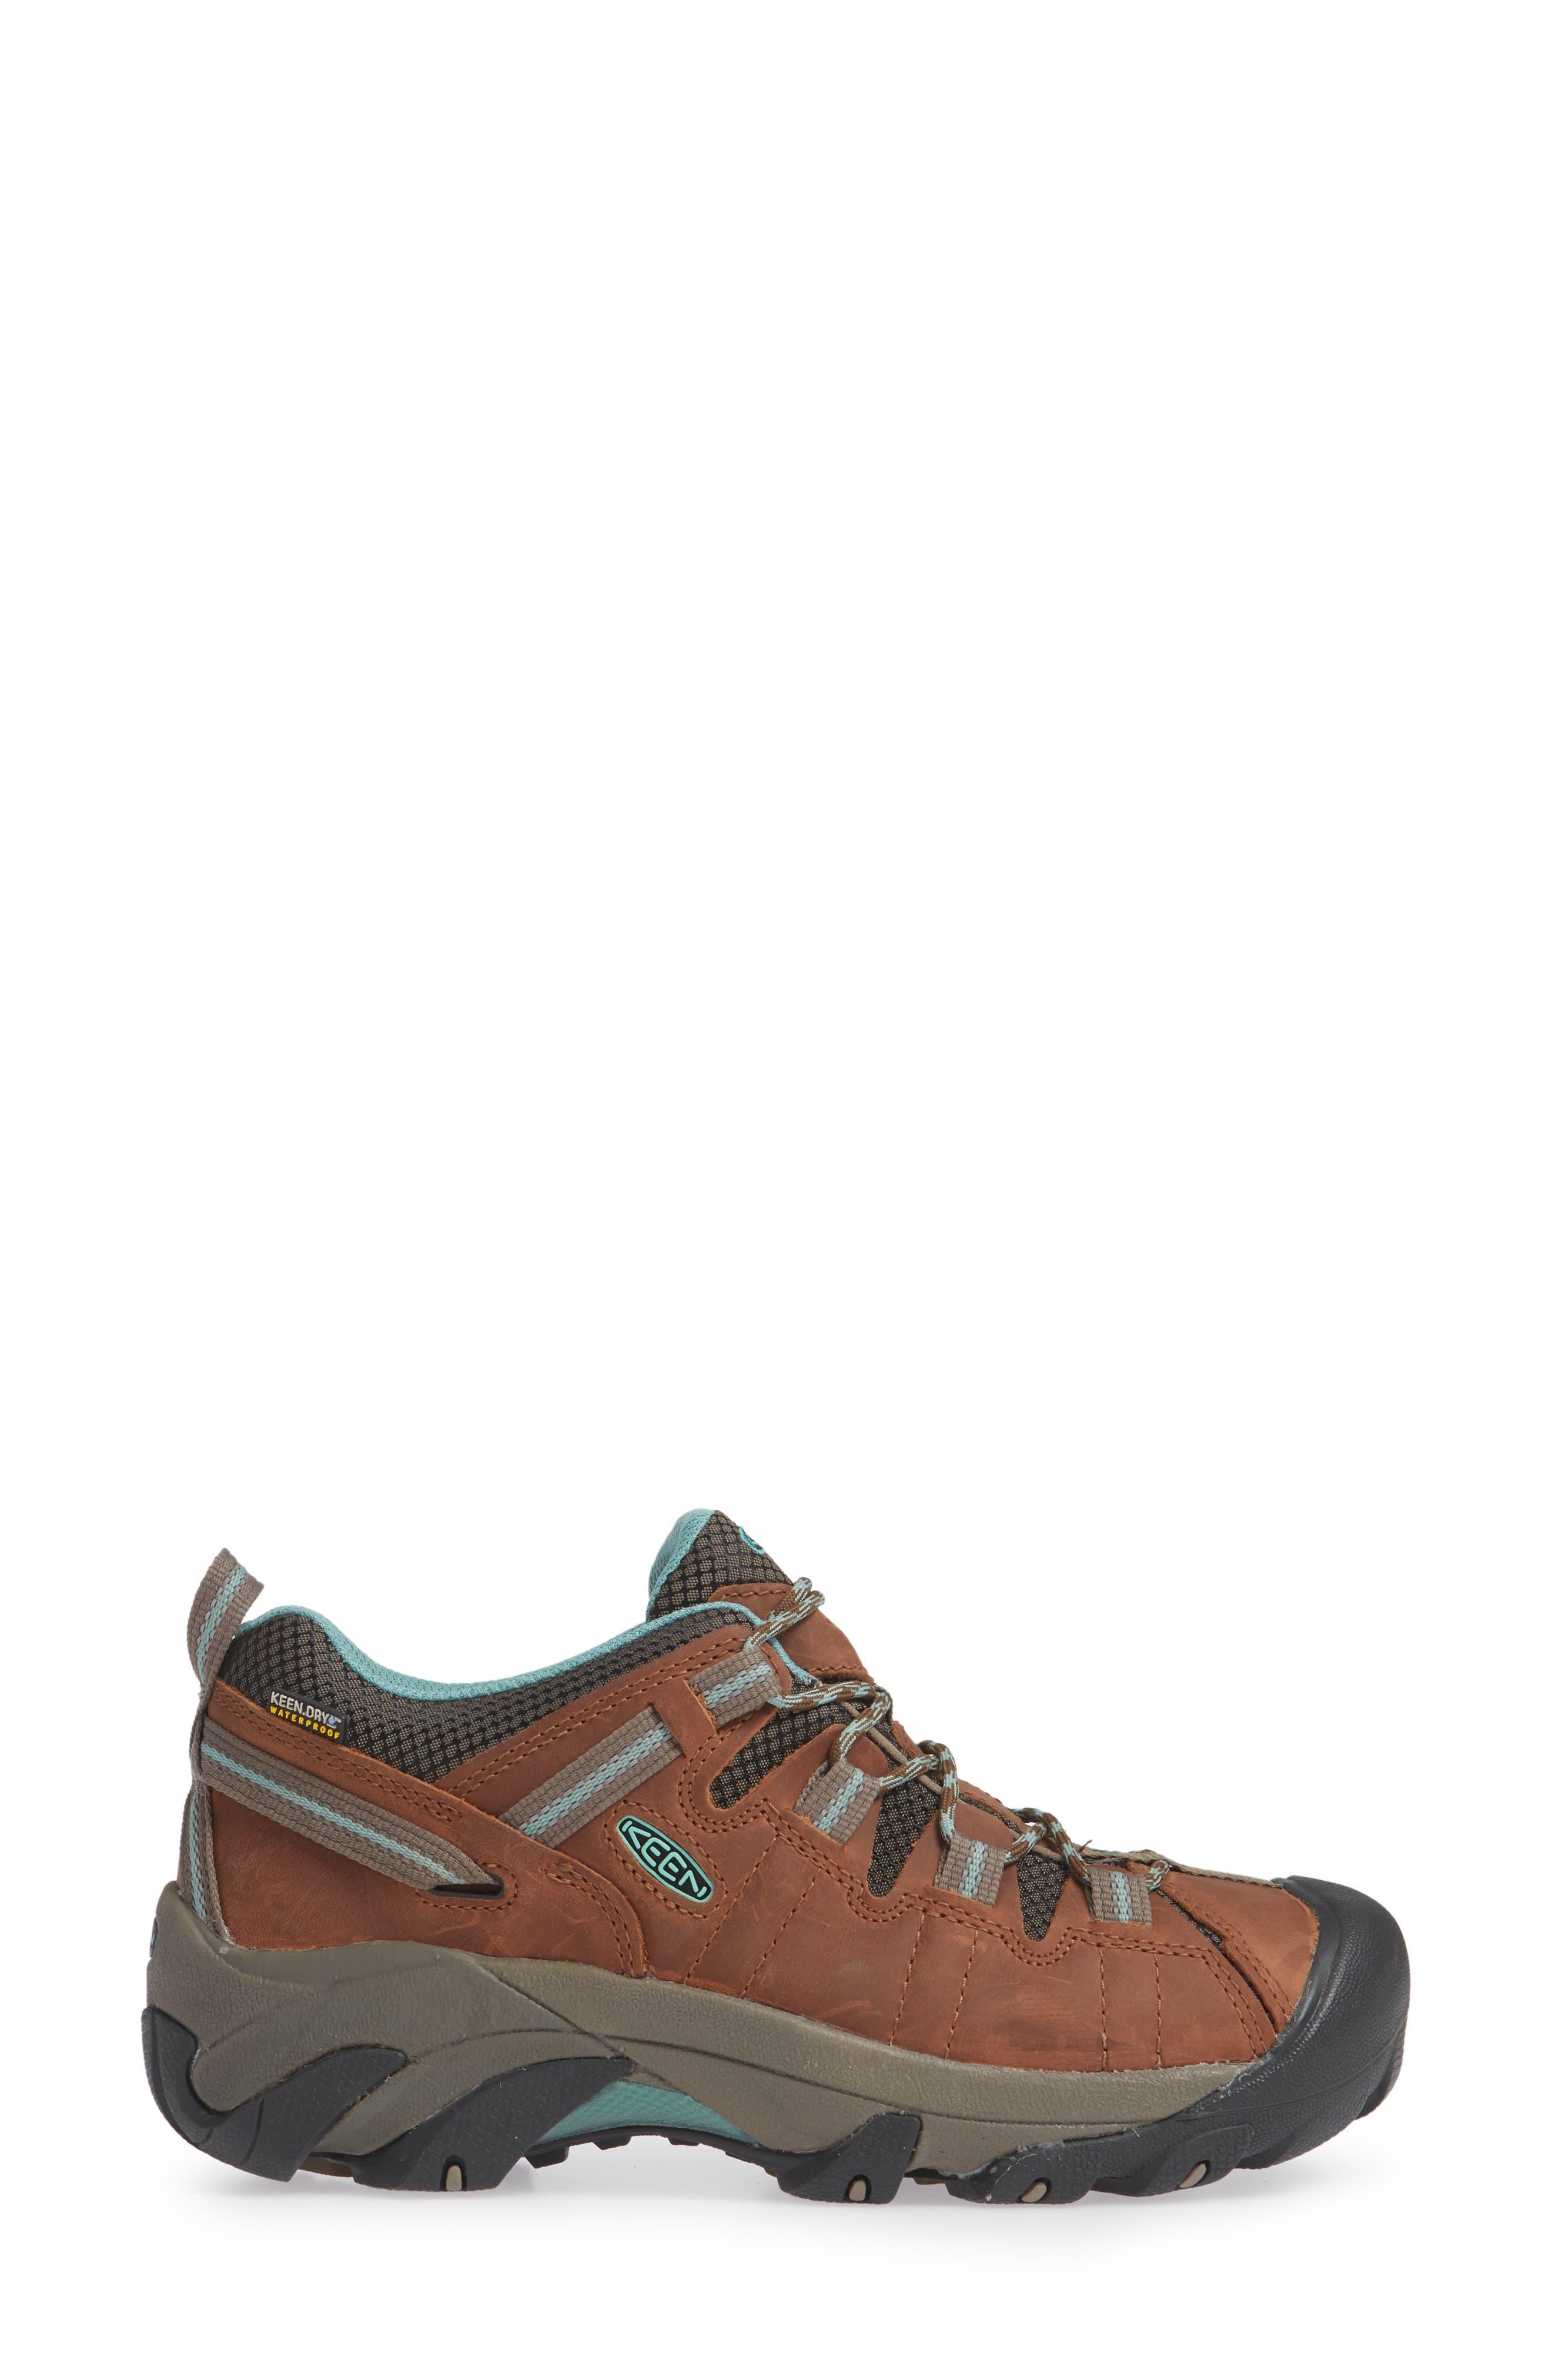 KEEN, 'Targhee II' Walking Shoe, Alternate thumbnail 3, color, DARK EARTH/ WASABI NUBUCK